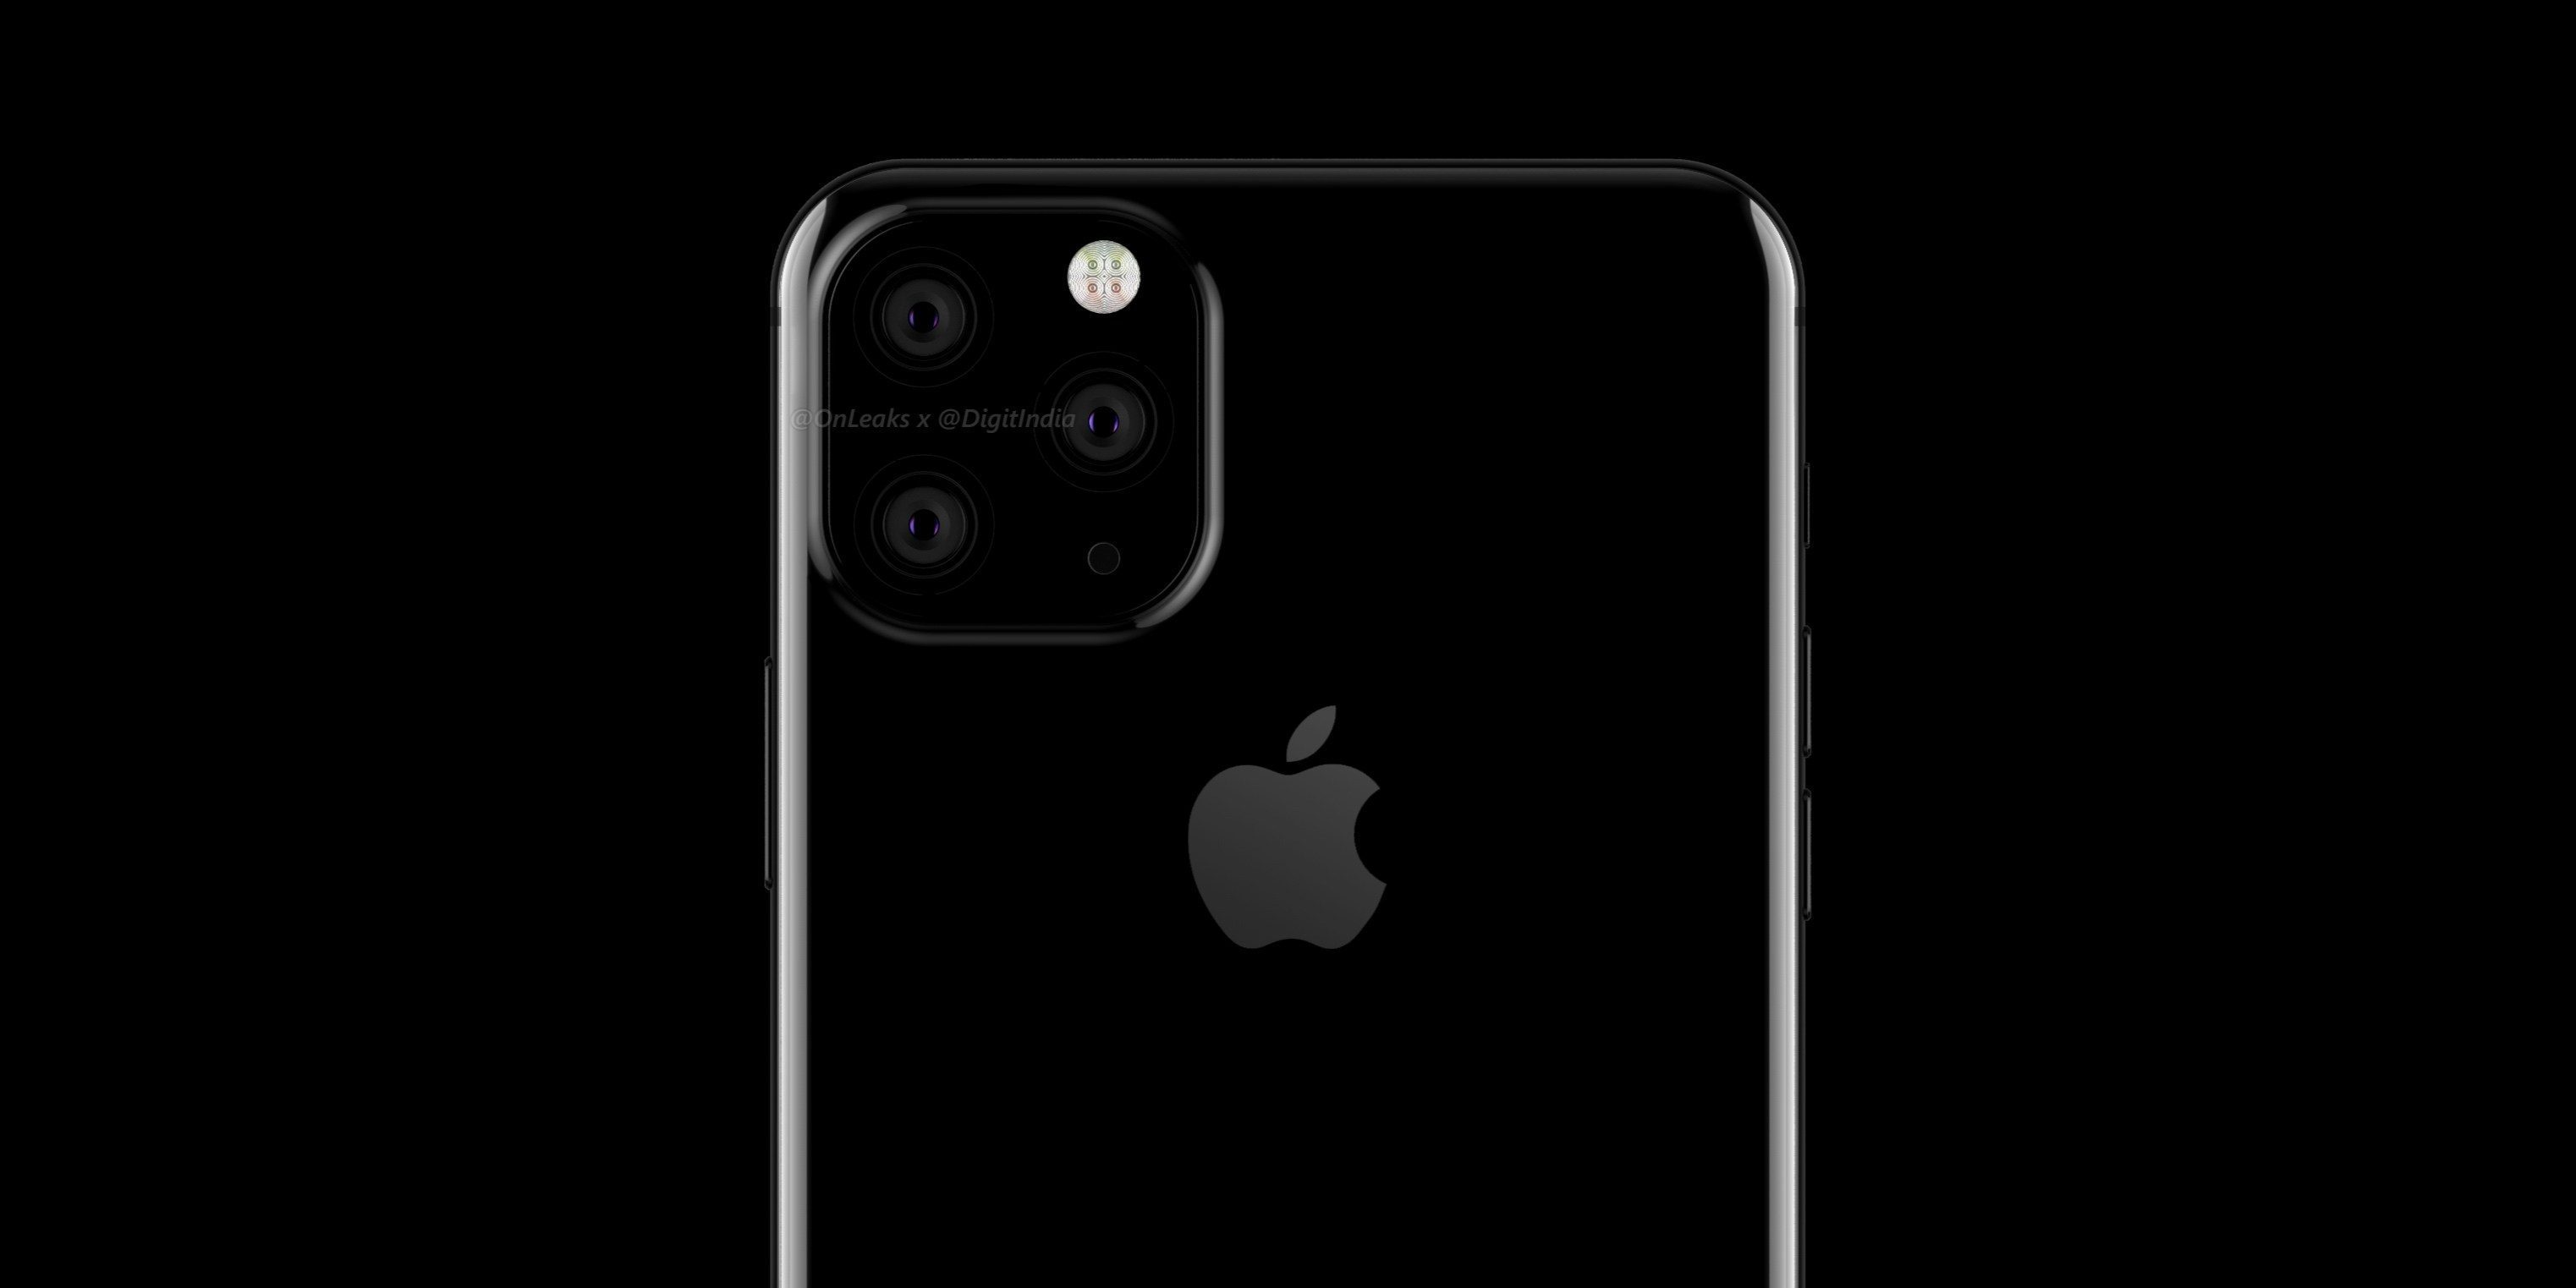 iphone xi, iphone 11